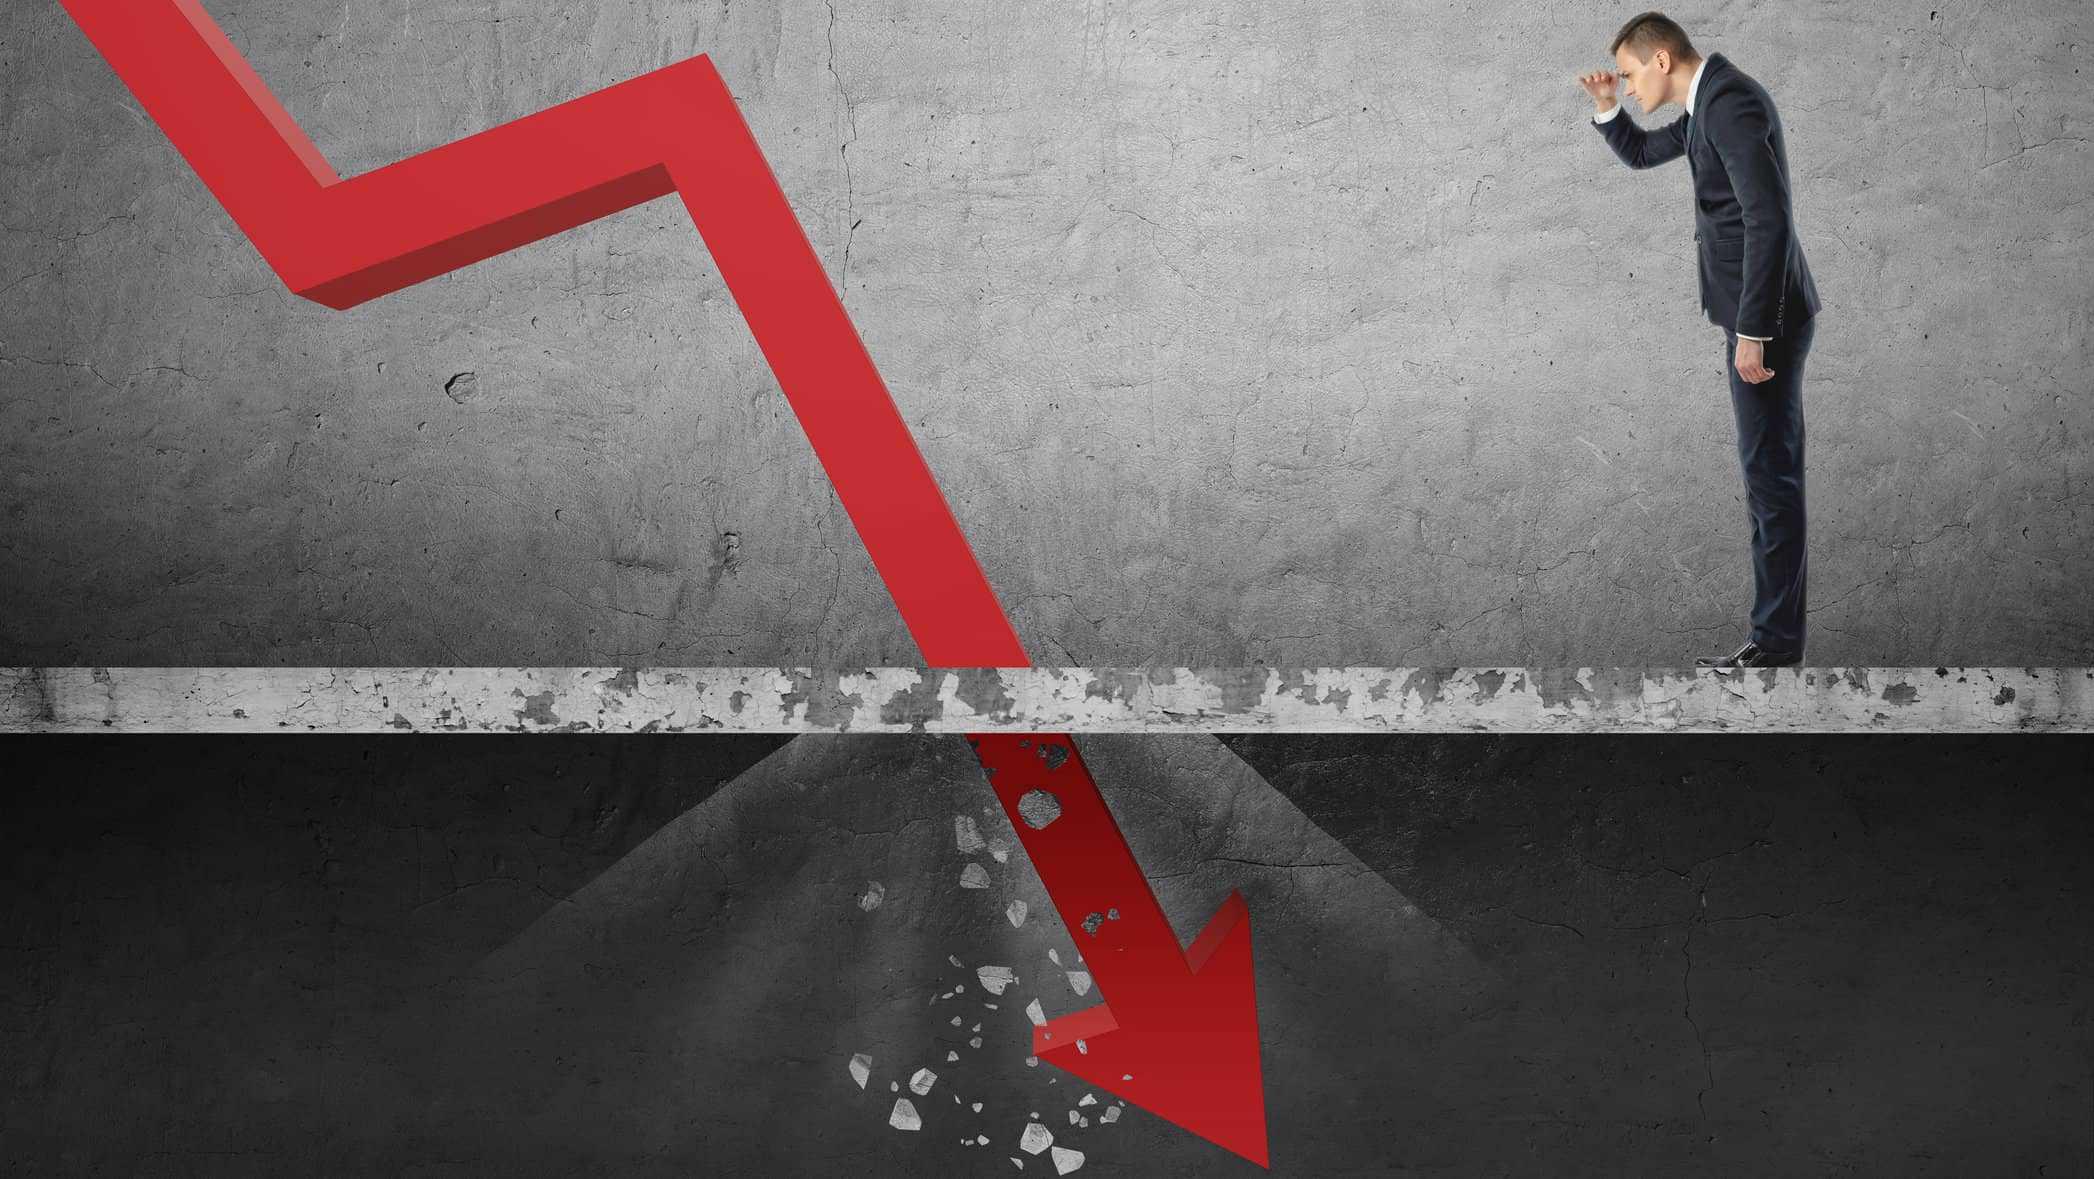 Share price plummet